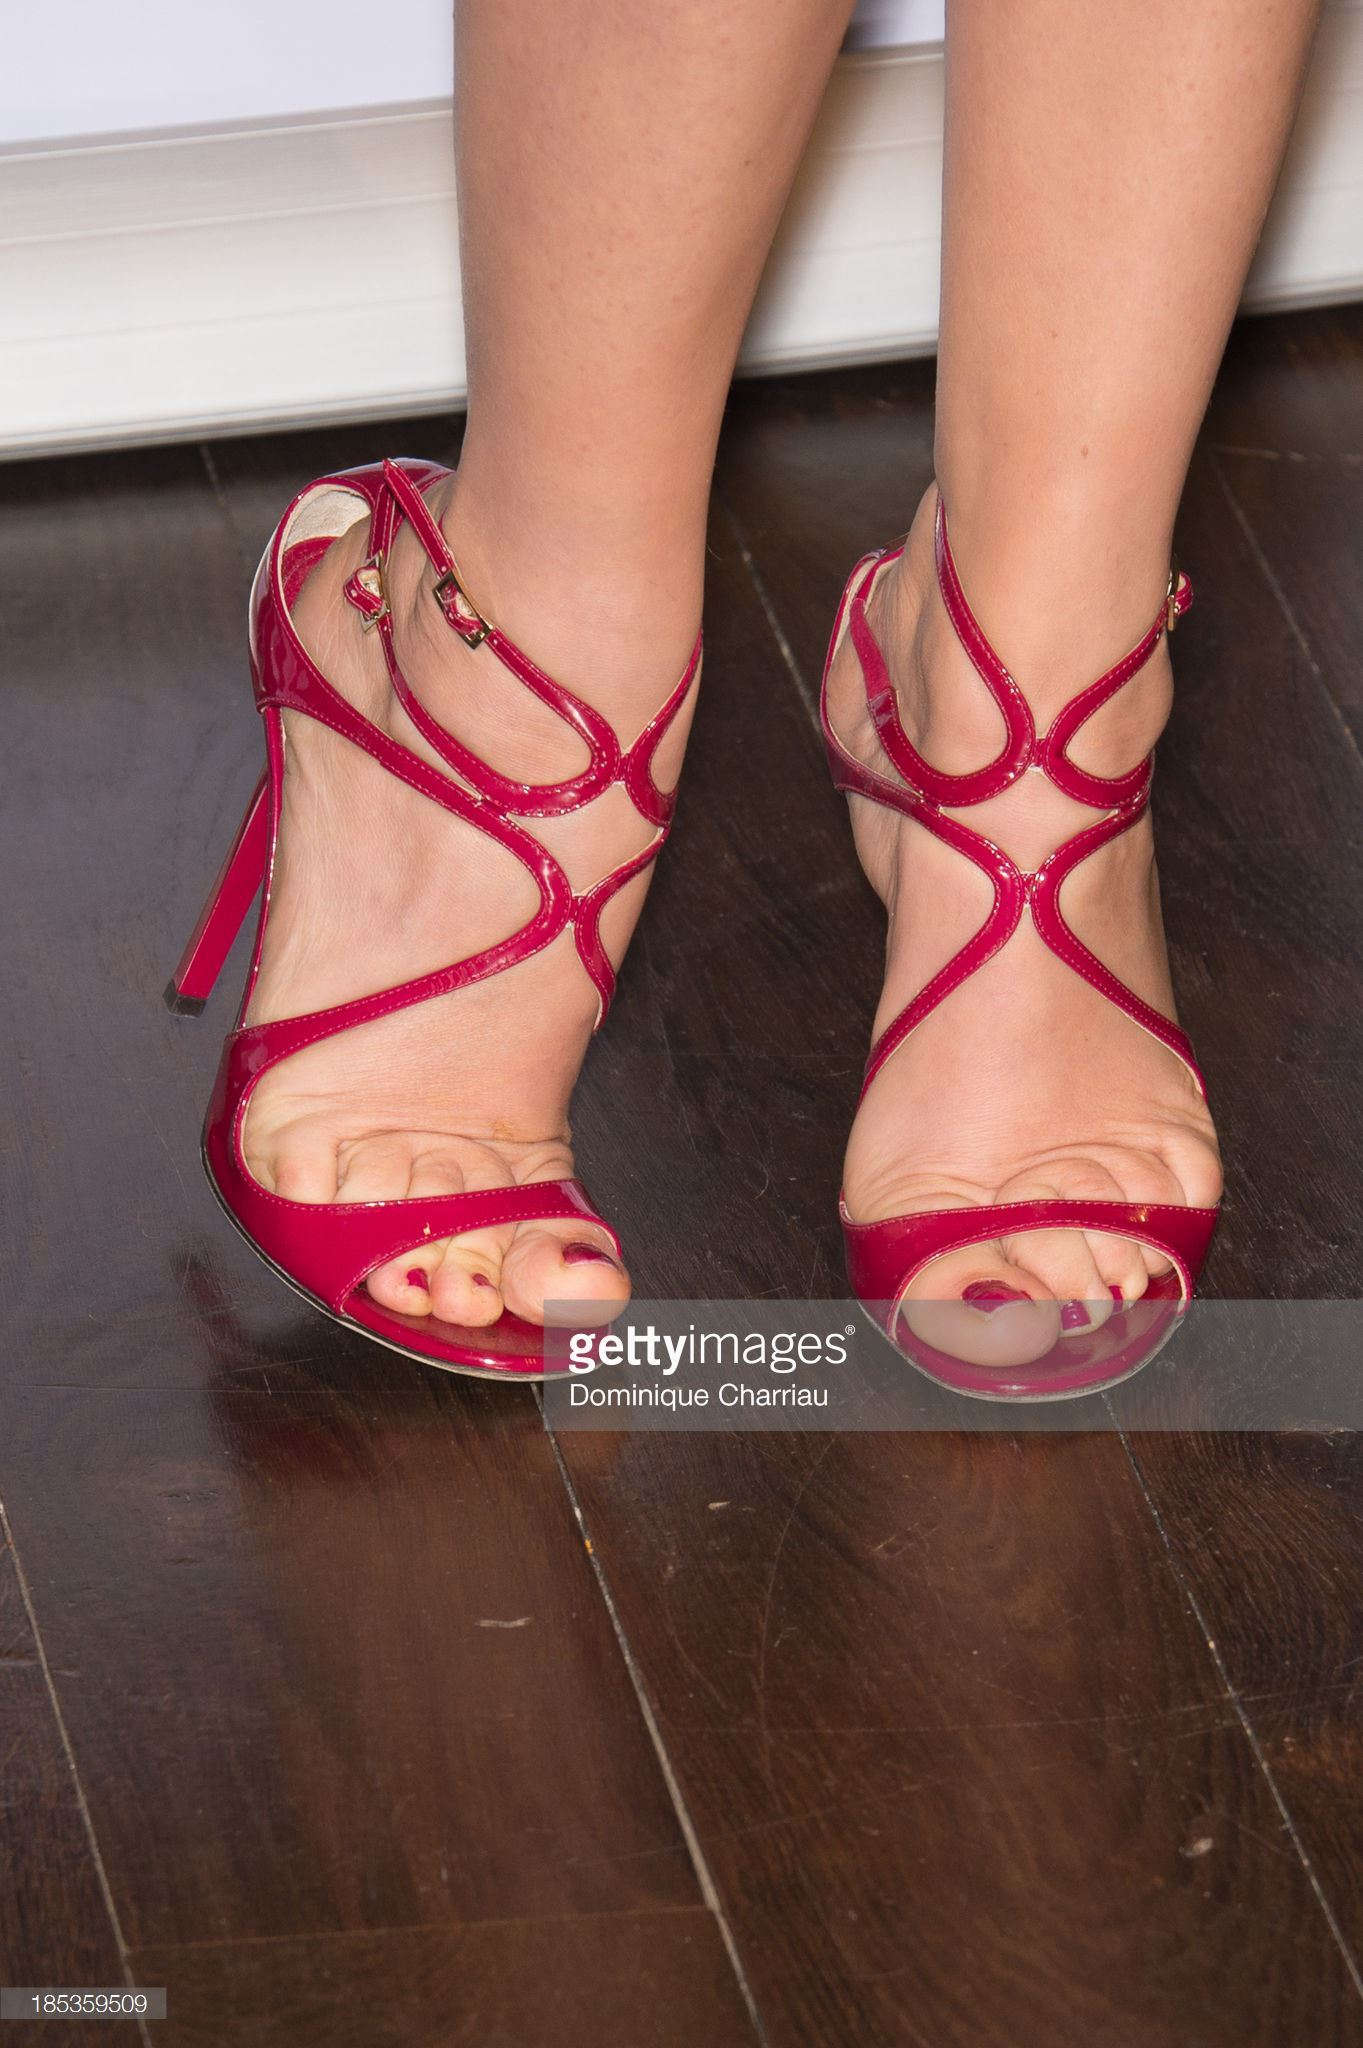 Feet Ludivine Kadri nude (69 photo), Ass, Leaked, Boobs, legs 2018